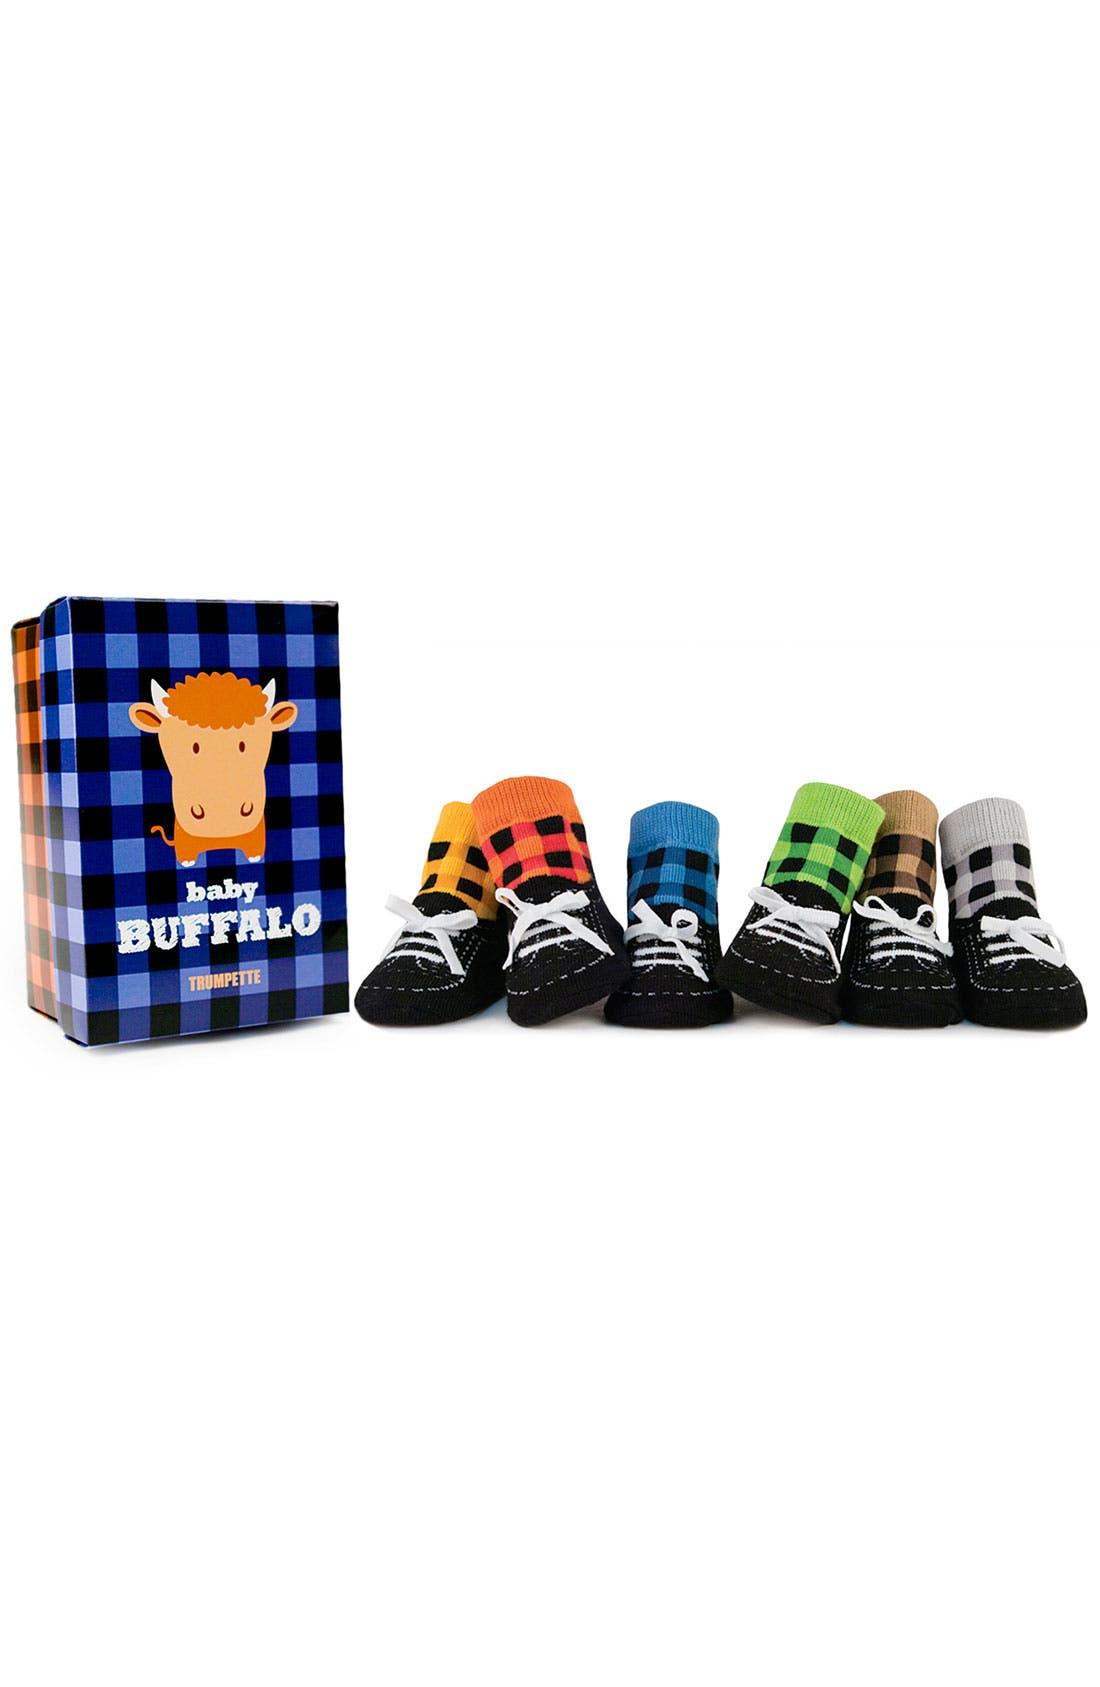 Alternate Image 1 Selected - Trumpette 'Baby Buffalo' Socks (6-Pack) (Infant)